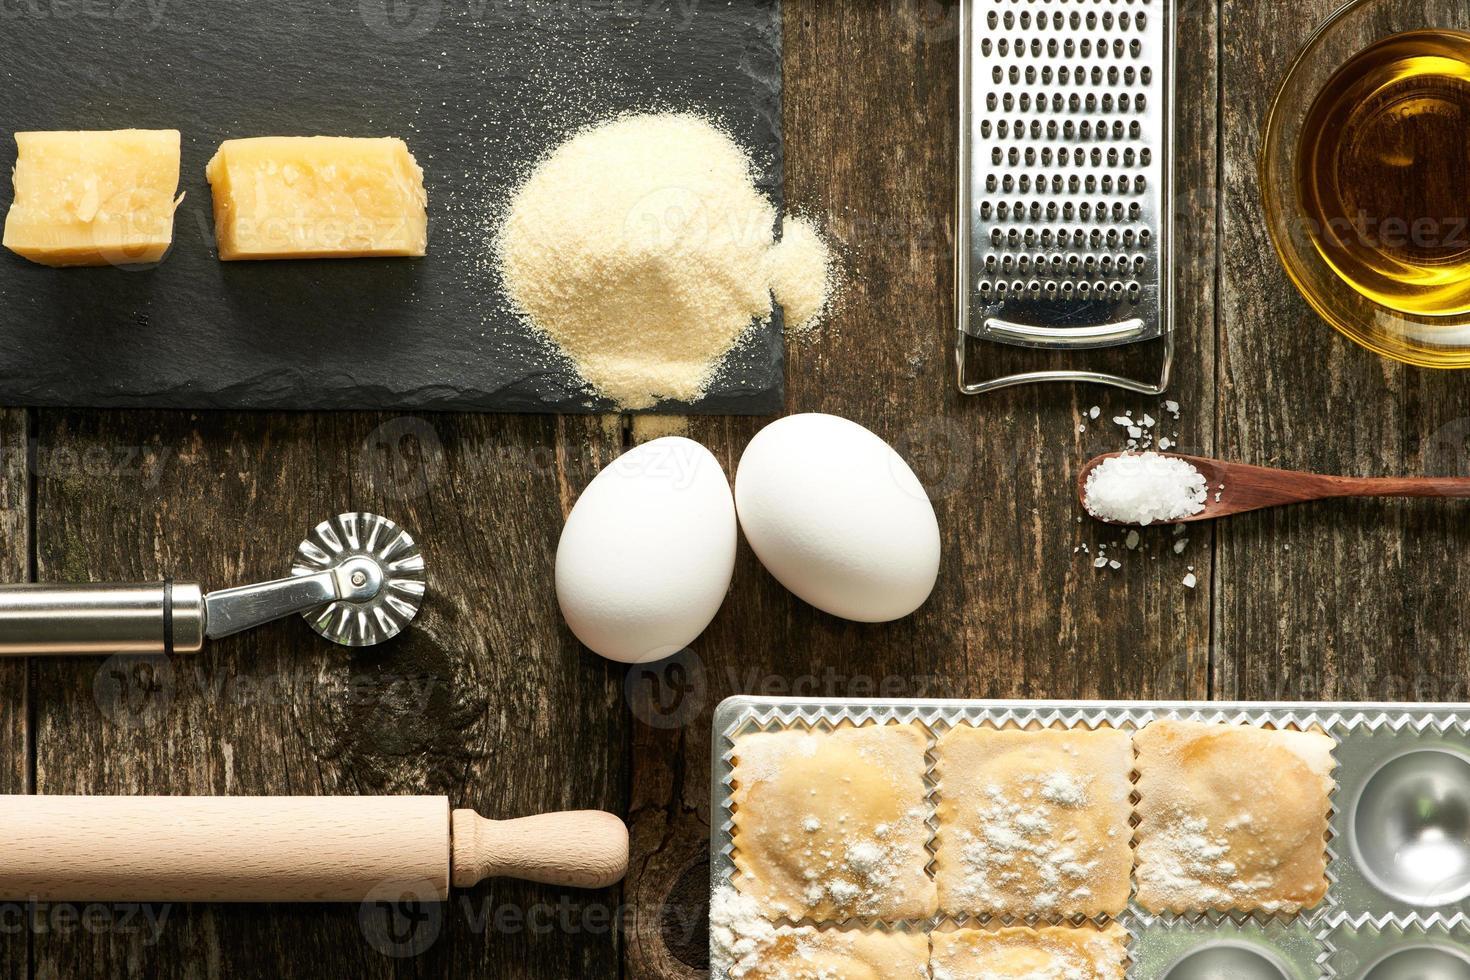 Utensils and ingredients for ravioli photo